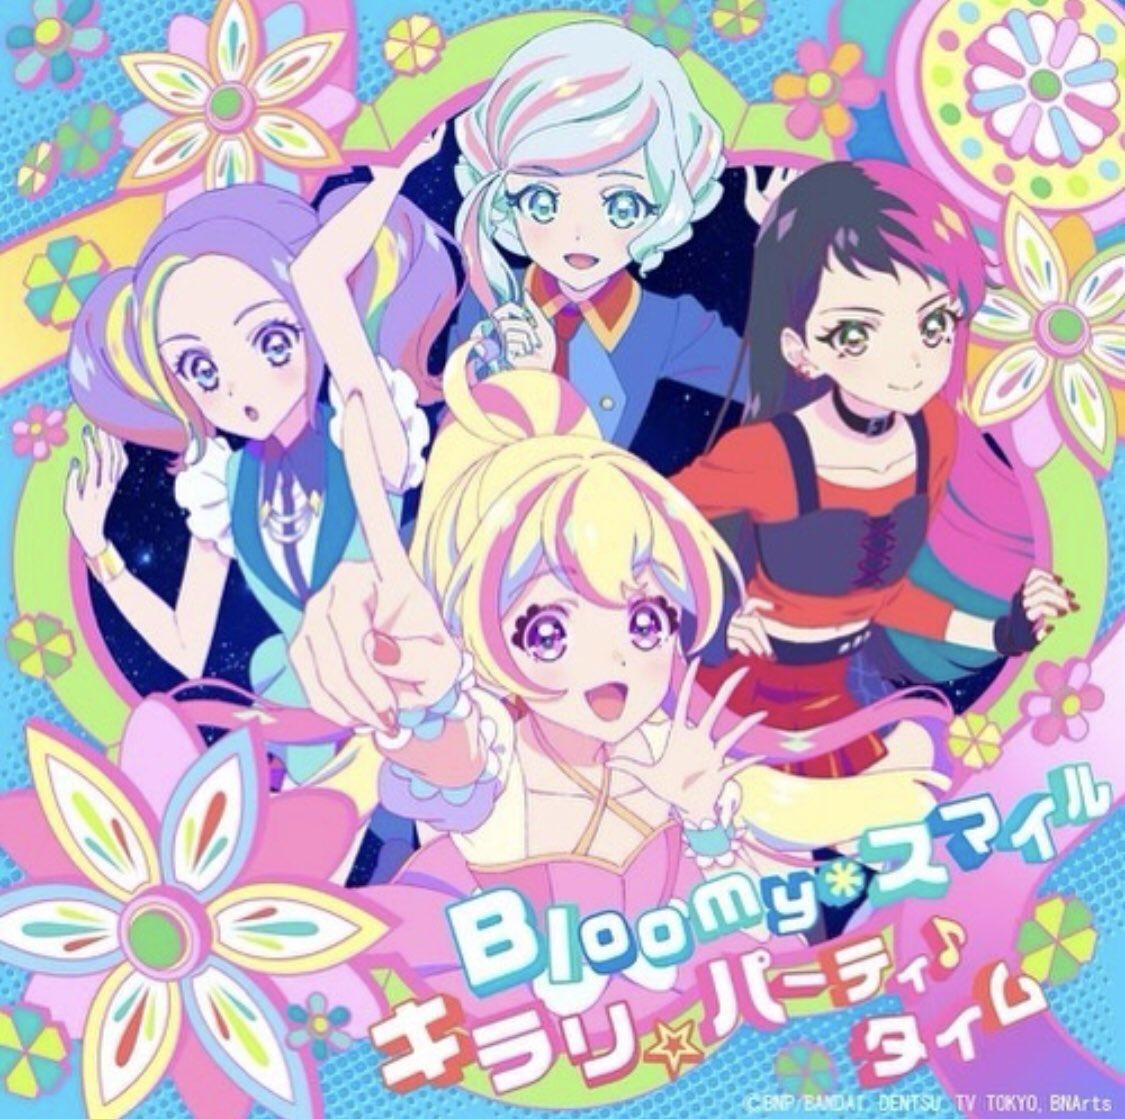 aikatsu planet bloomy smile anime version